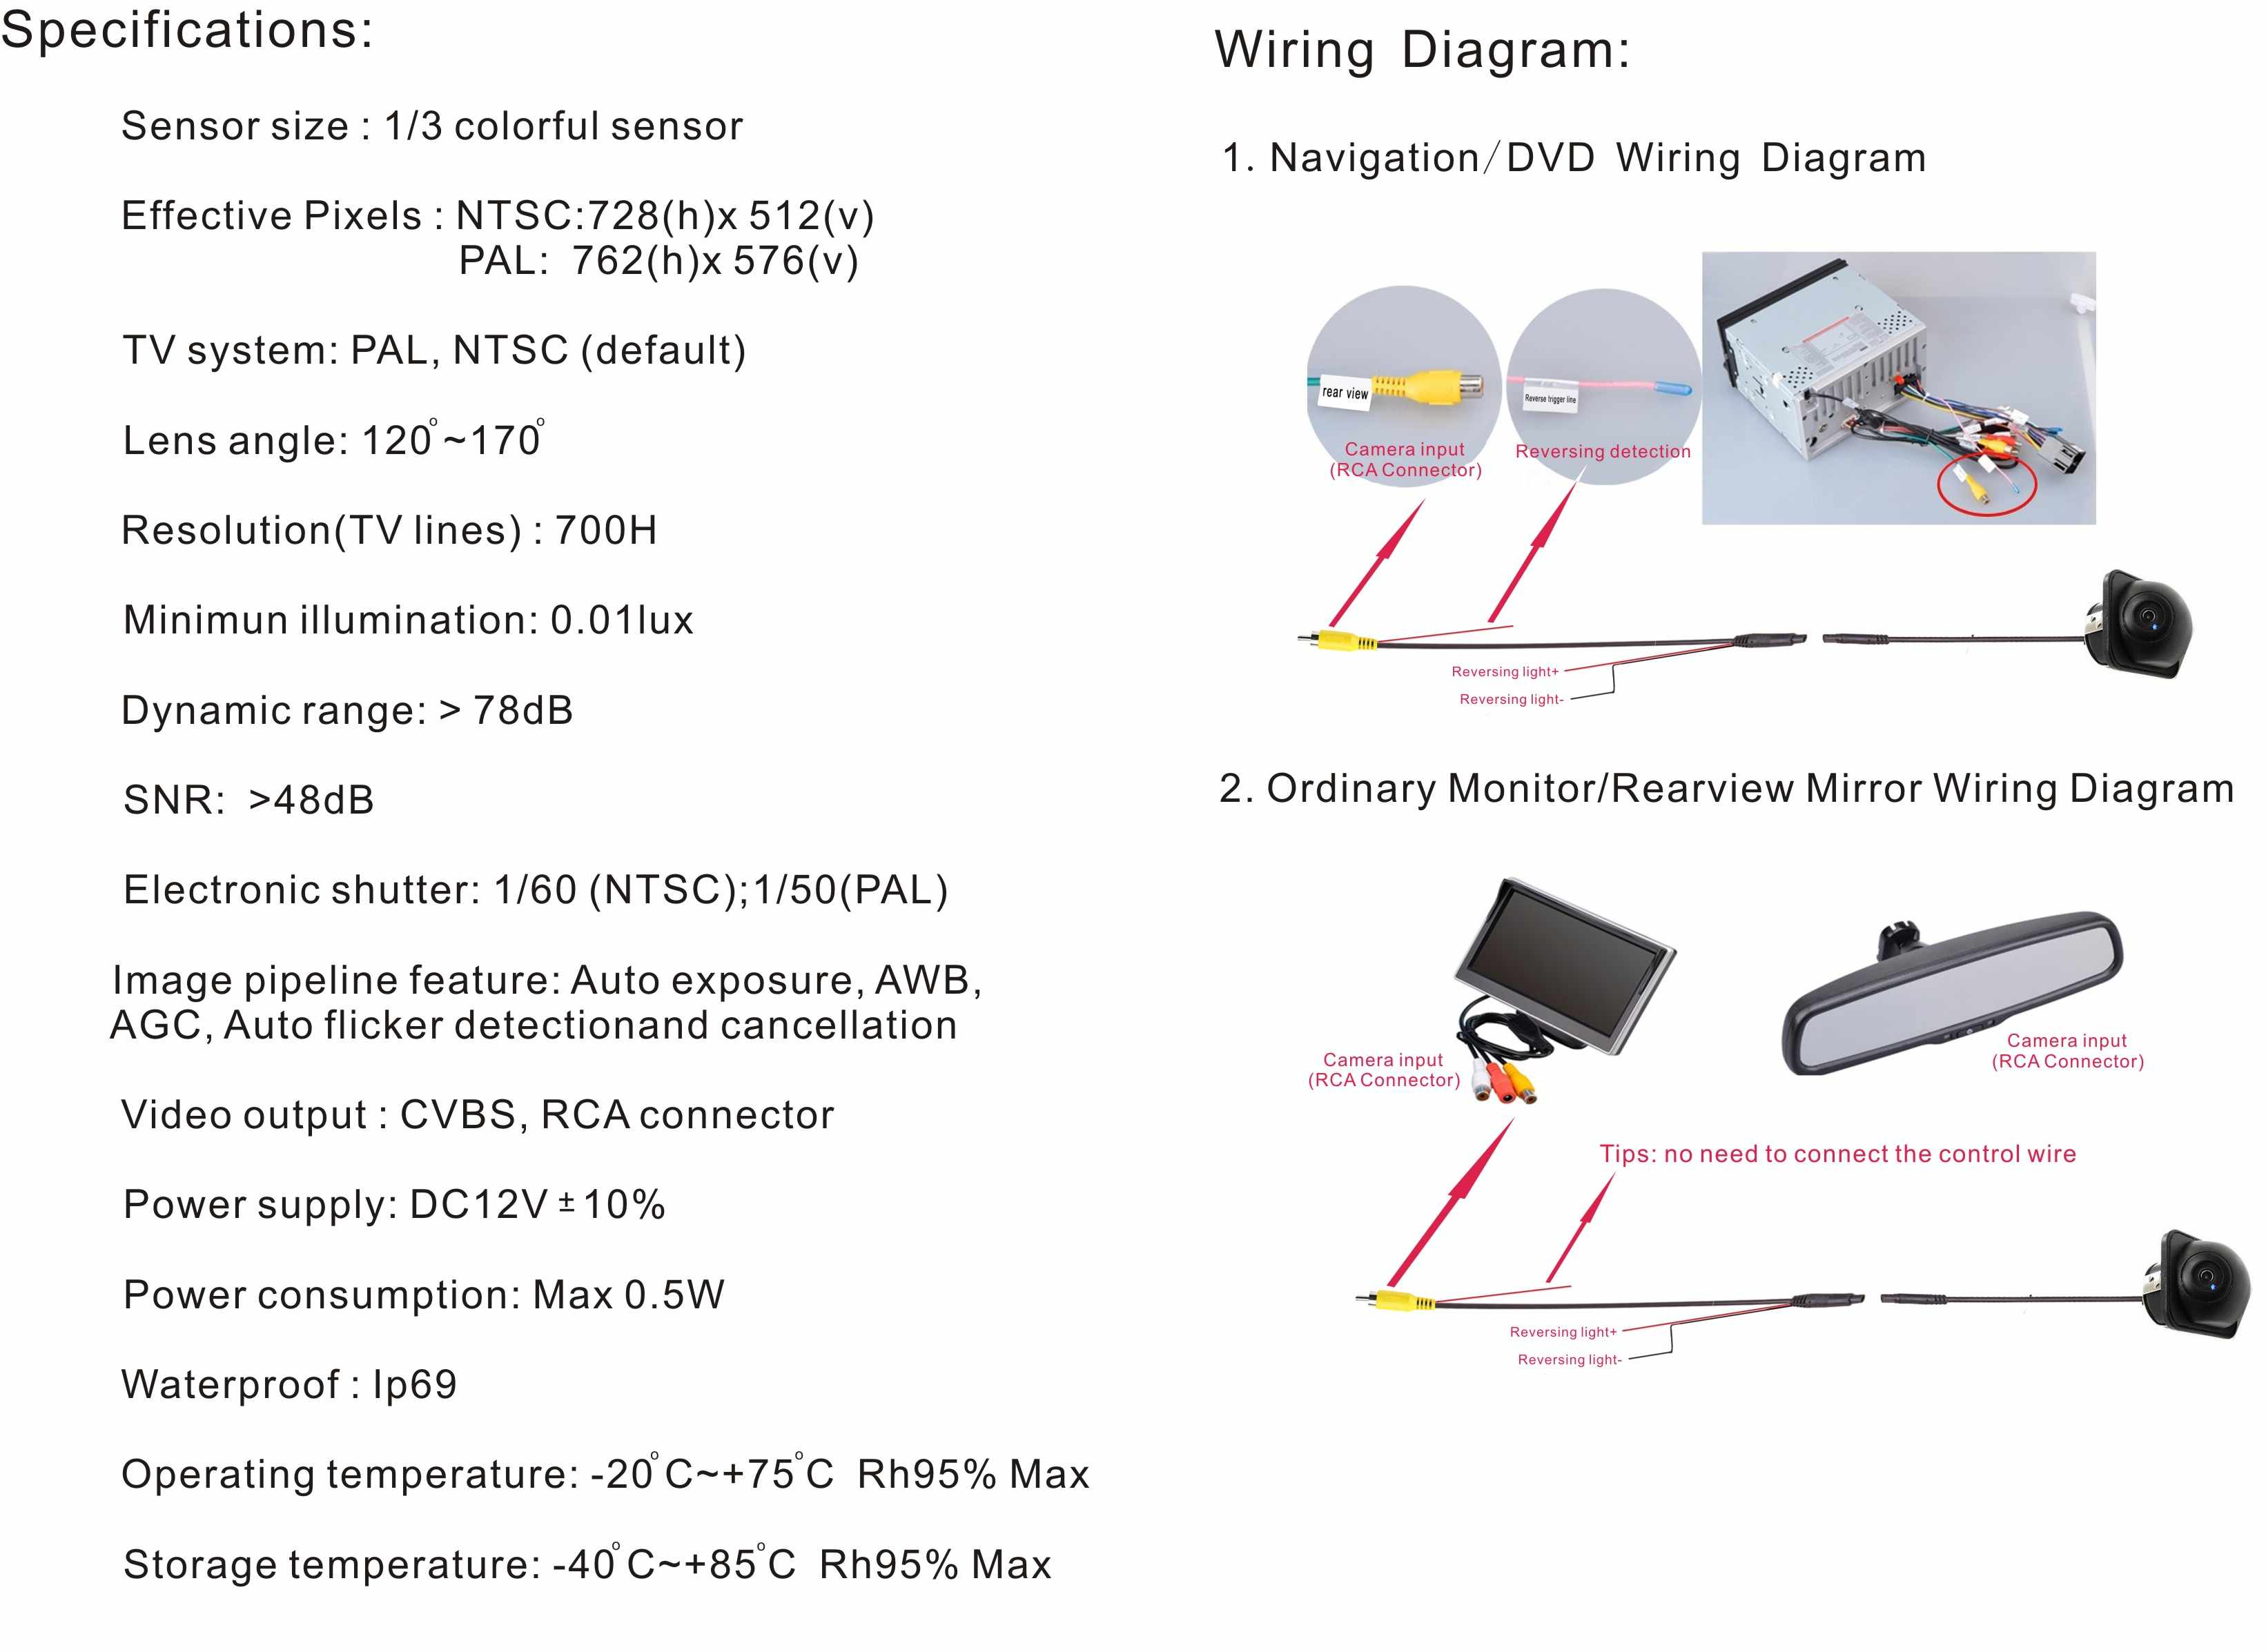 Ford F250 Backup Camera Wiring Diagram from ae01.alicdn.com